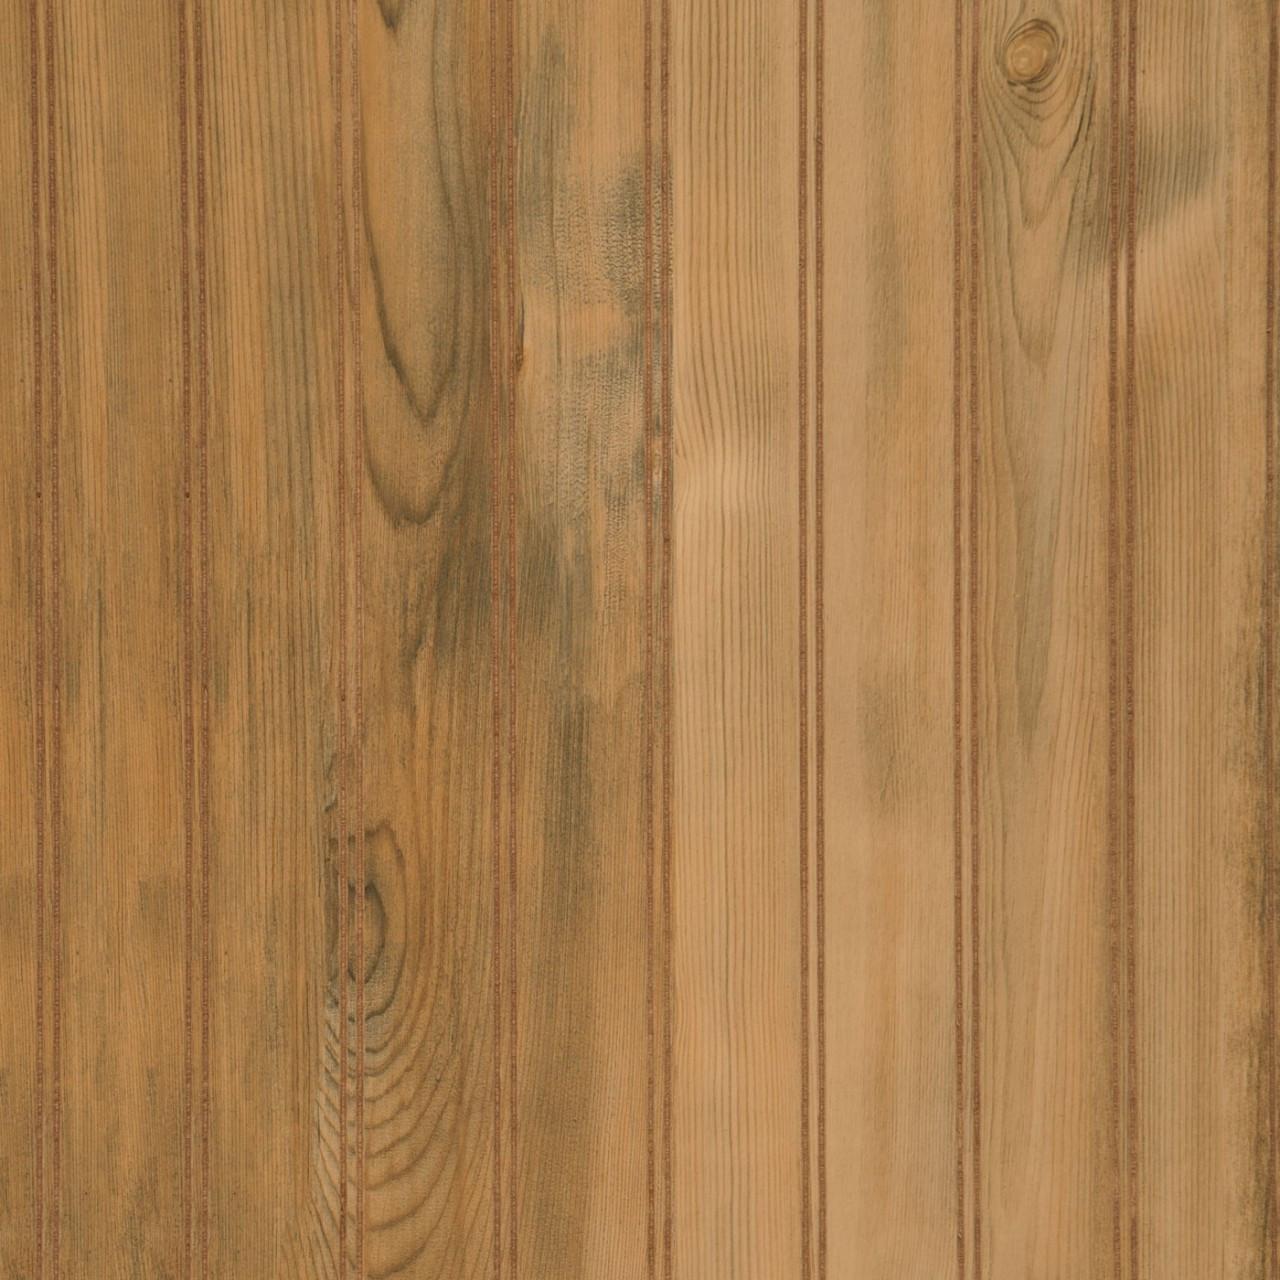 Beadboard Wall Paneling : Rustic wall paneling beadboard swampland cypress mm